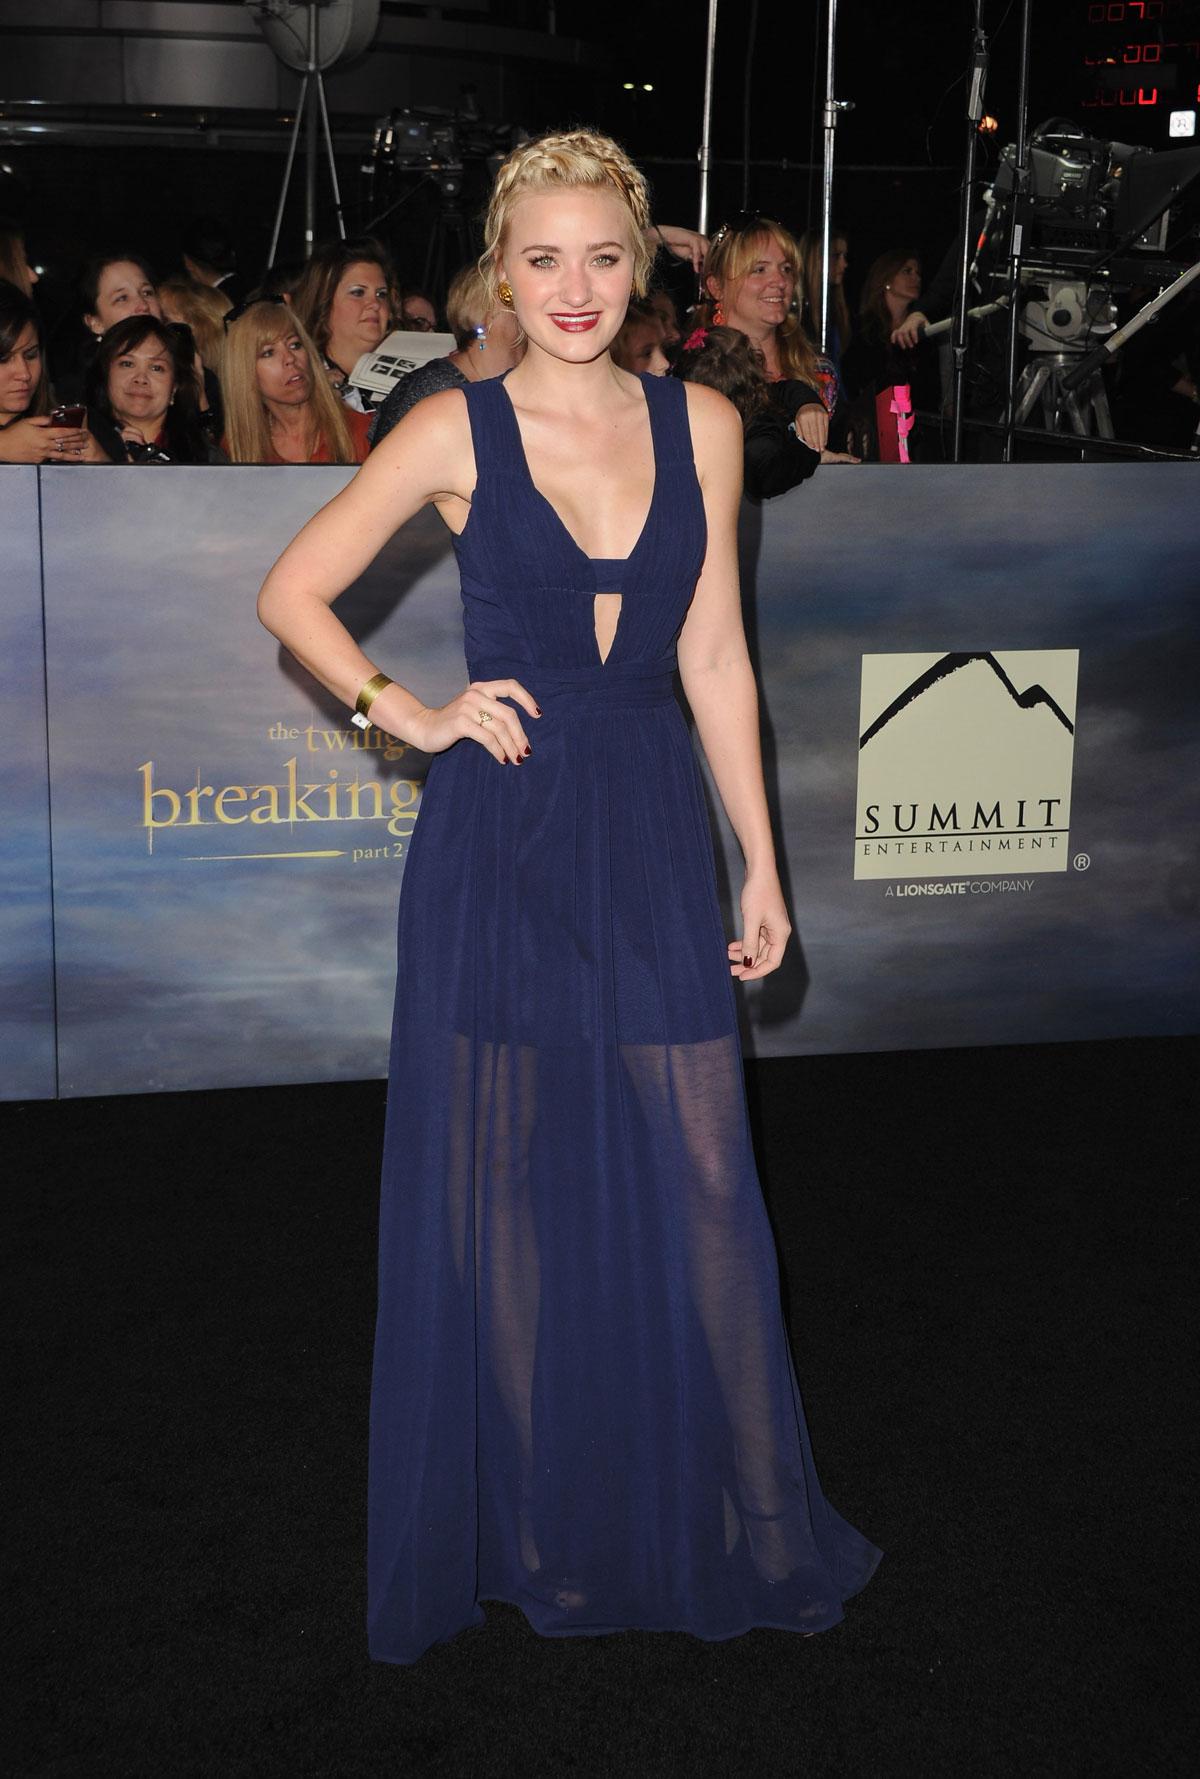 AJ MICHALKA at The Twilight Saga: Breaking Dawn - Part 2